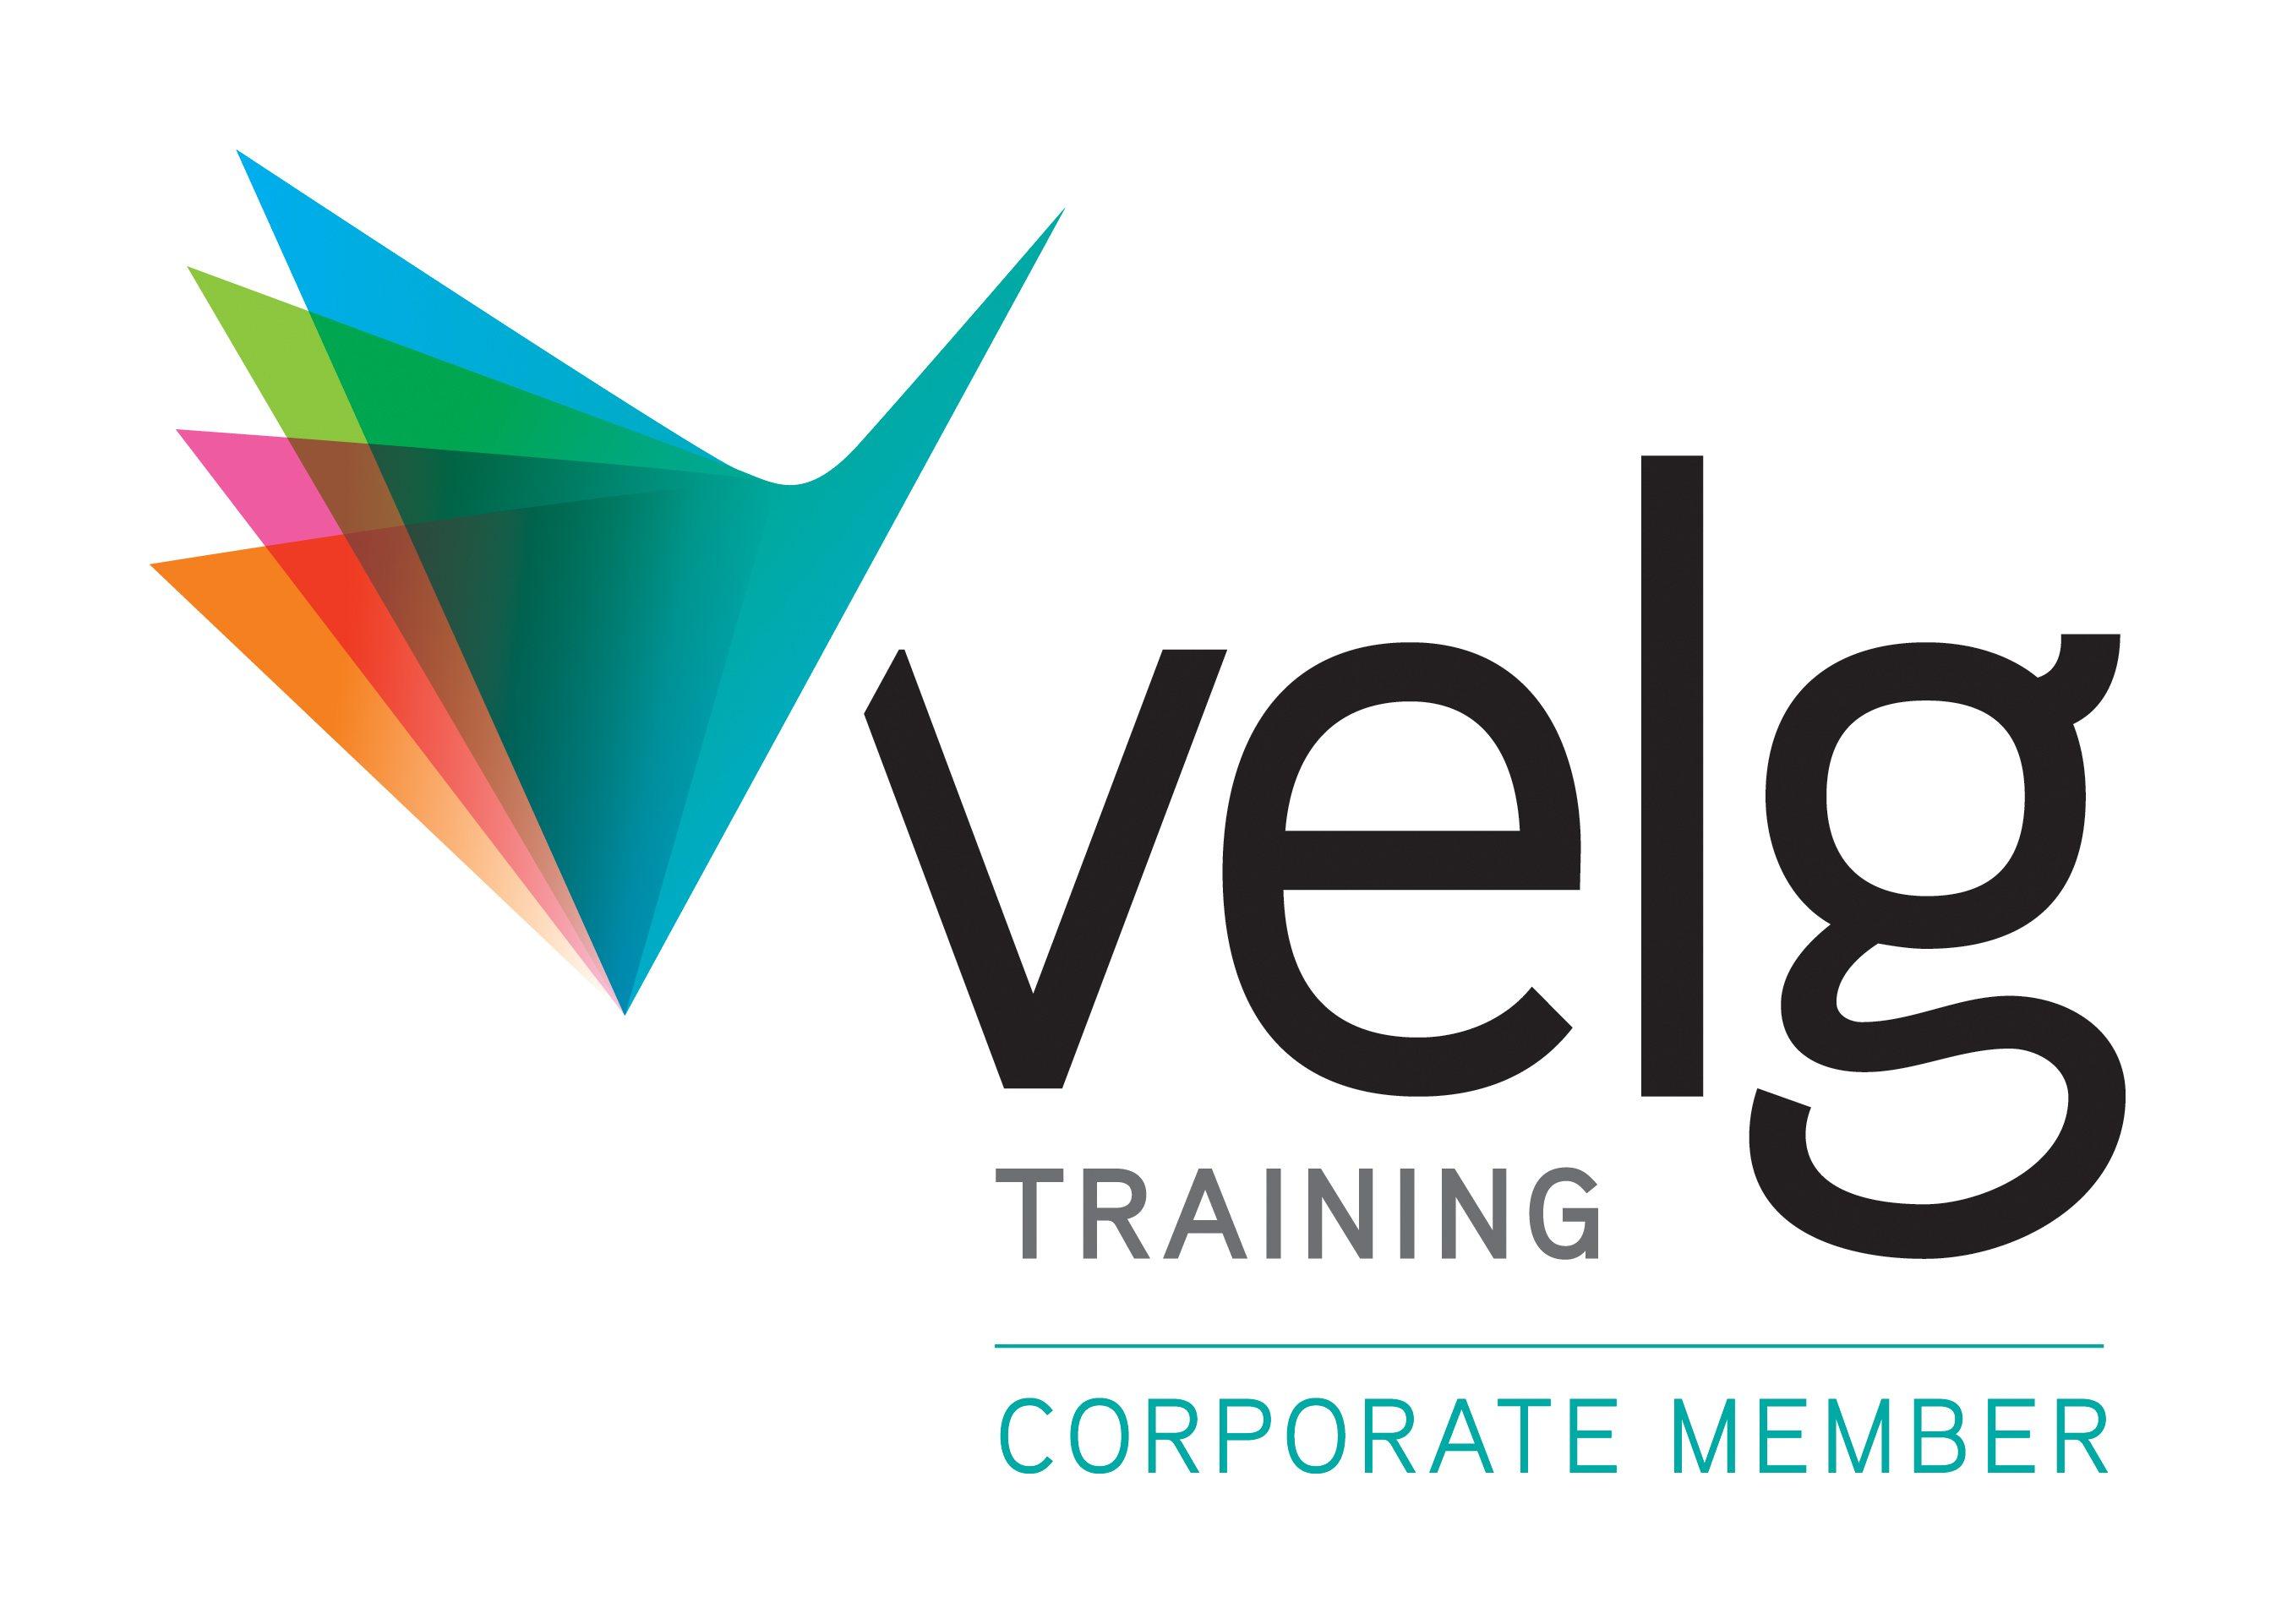 VELG training membership